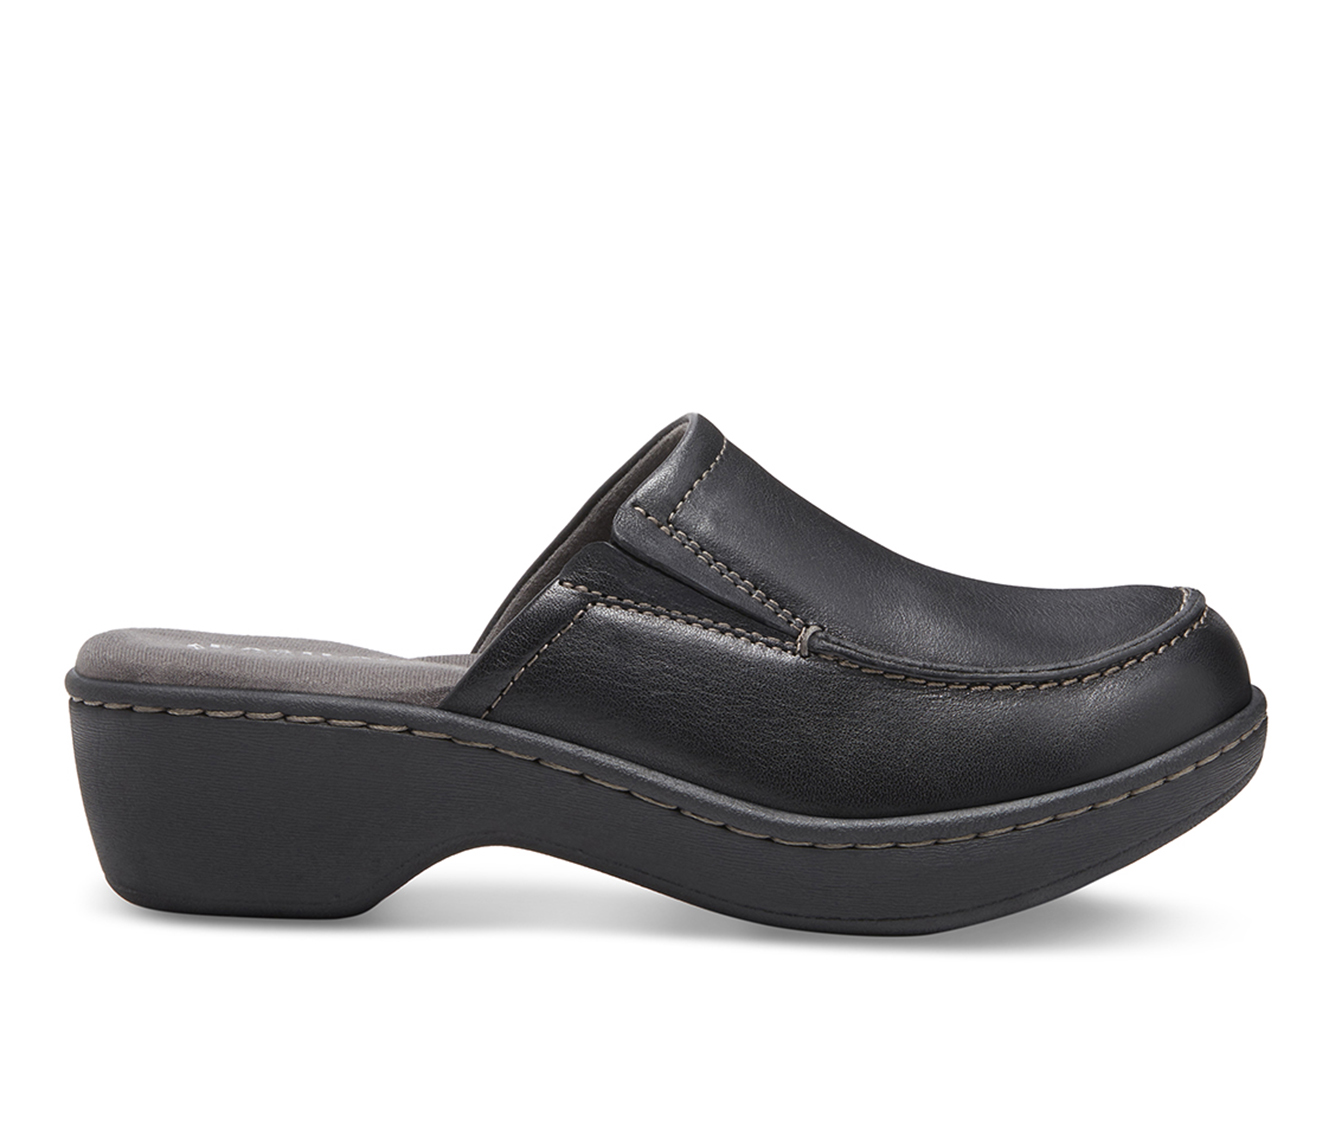 Eastland Georgia Women's Shoe (Black Leather)